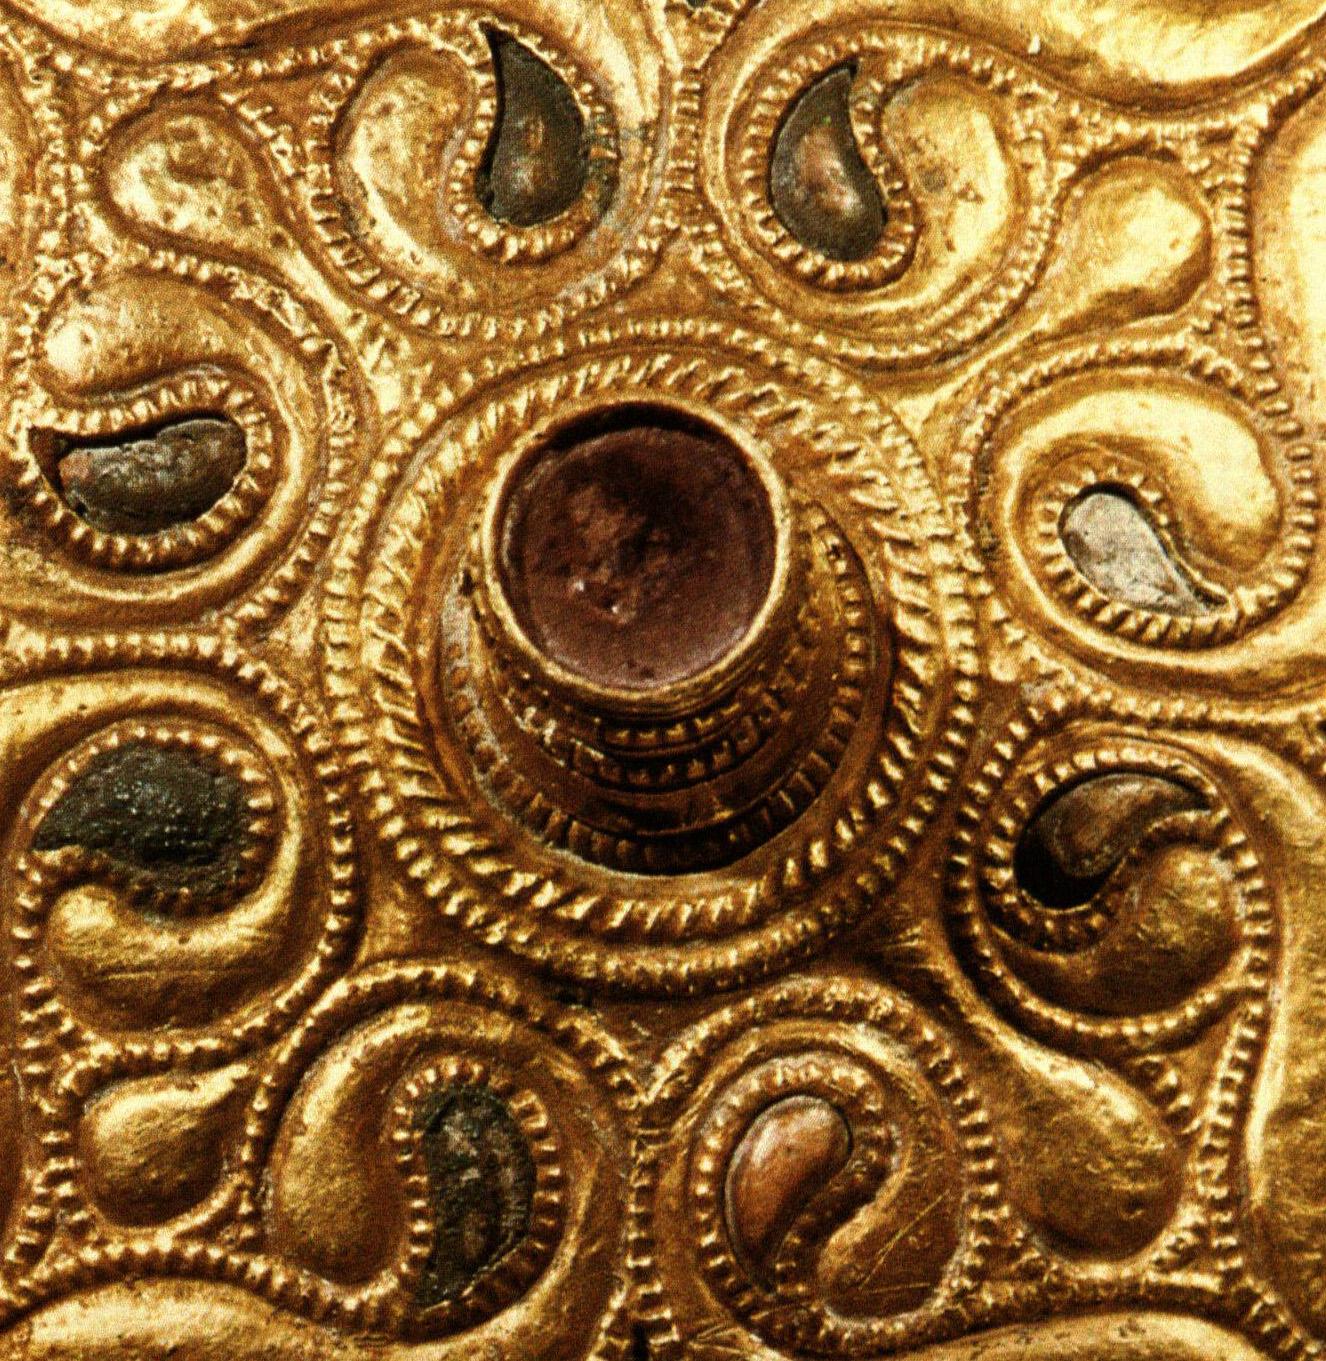 file celtic gold plated disc auvers sur oise val d 39 oise detail 01 jpg. Black Bedroom Furniture Sets. Home Design Ideas